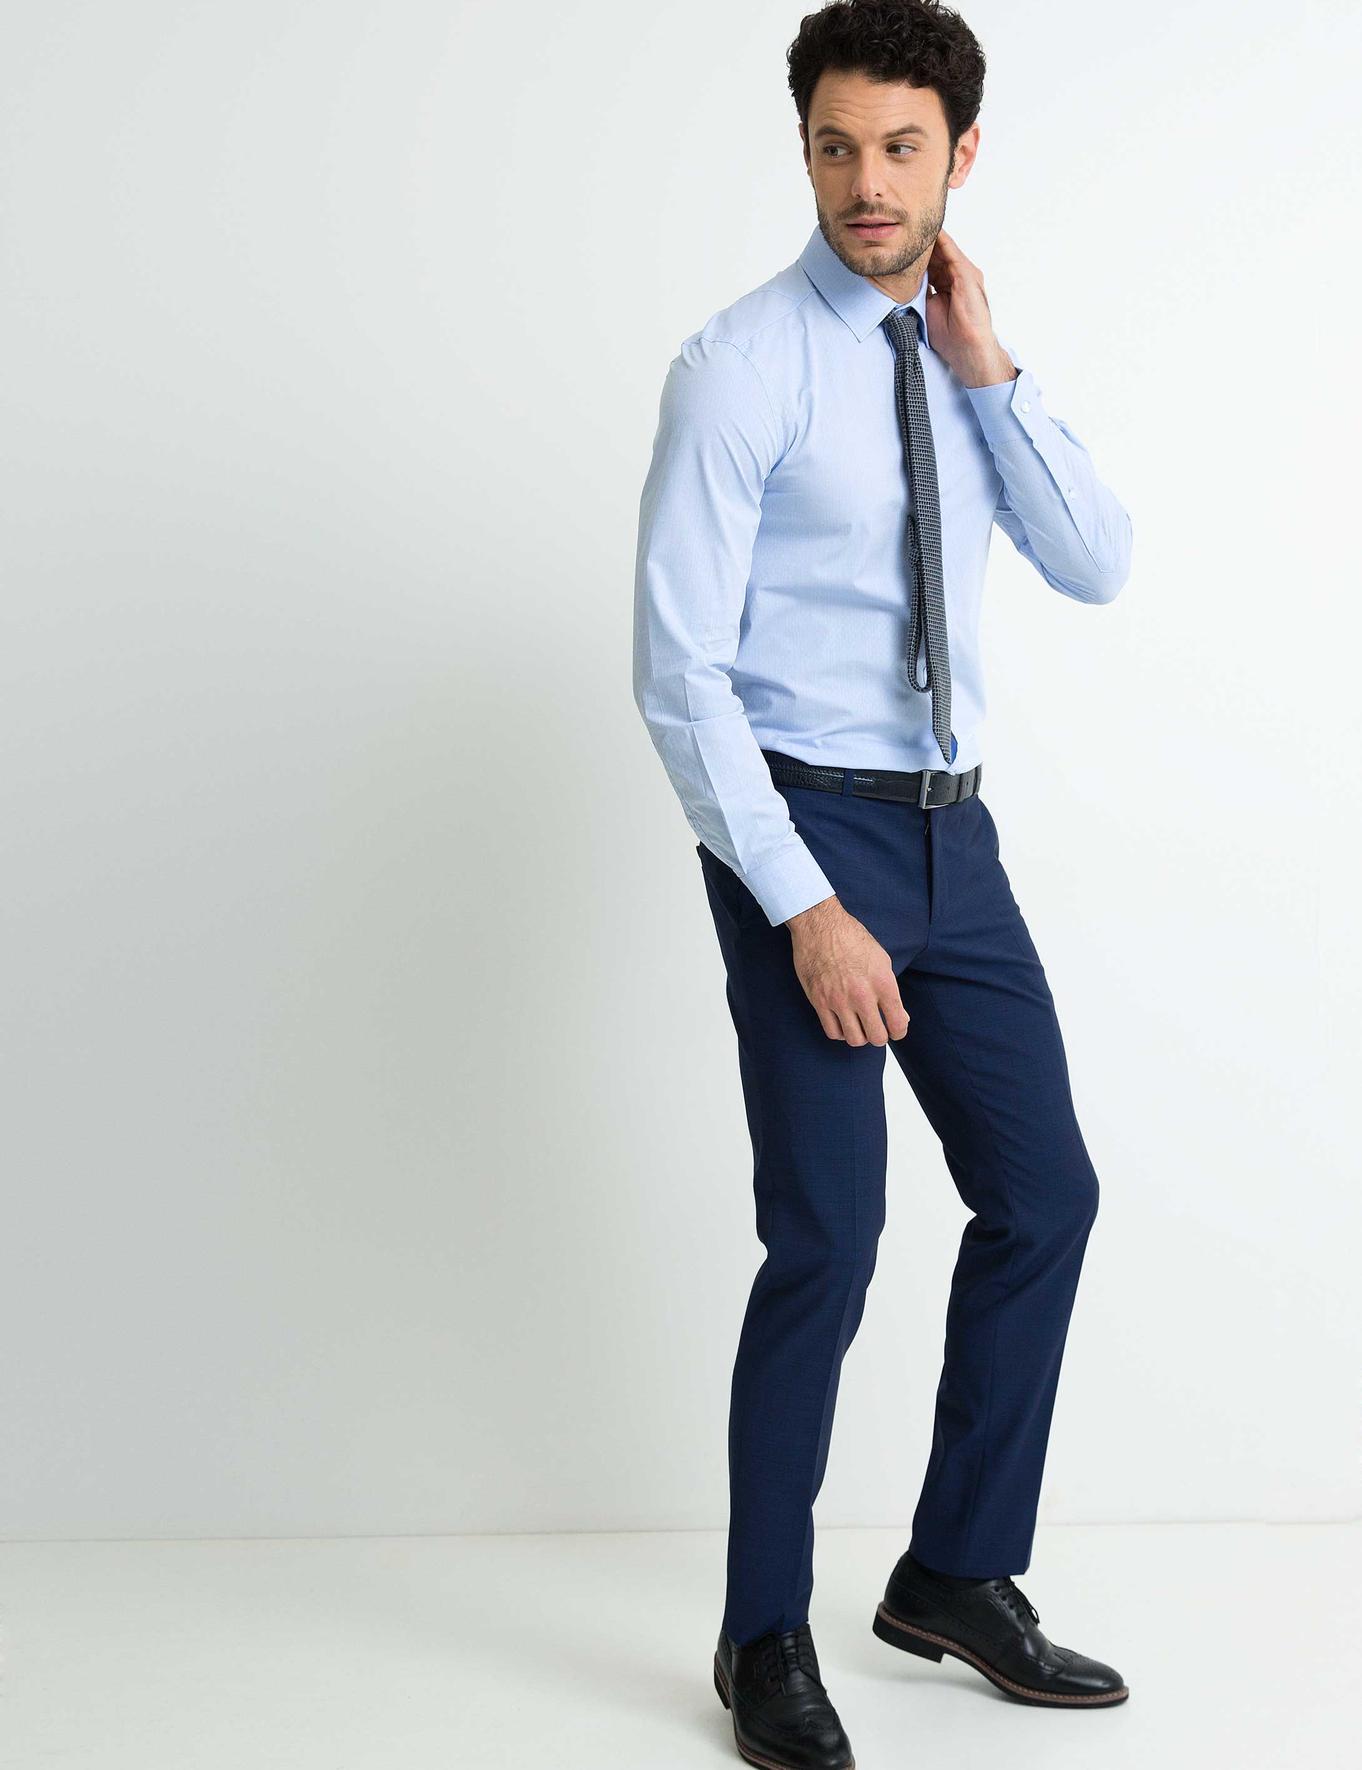 Açık Mavi Slim Fit Gömlek - 50201246020